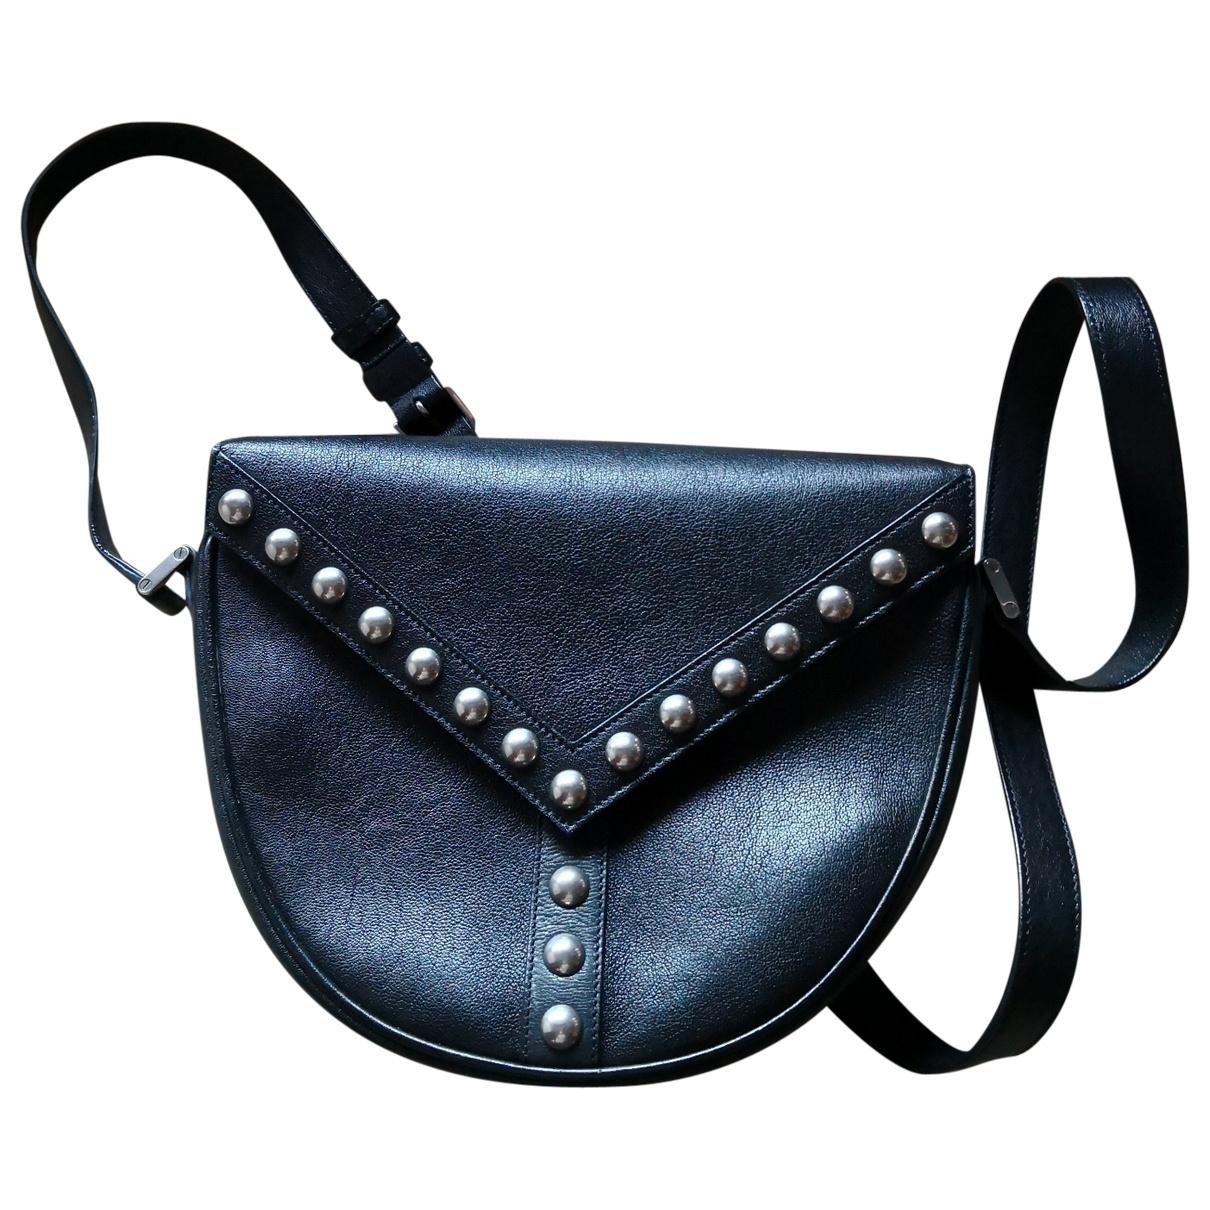 Saint Laurent Satchel Y studs Black Leather handbag for Women \N